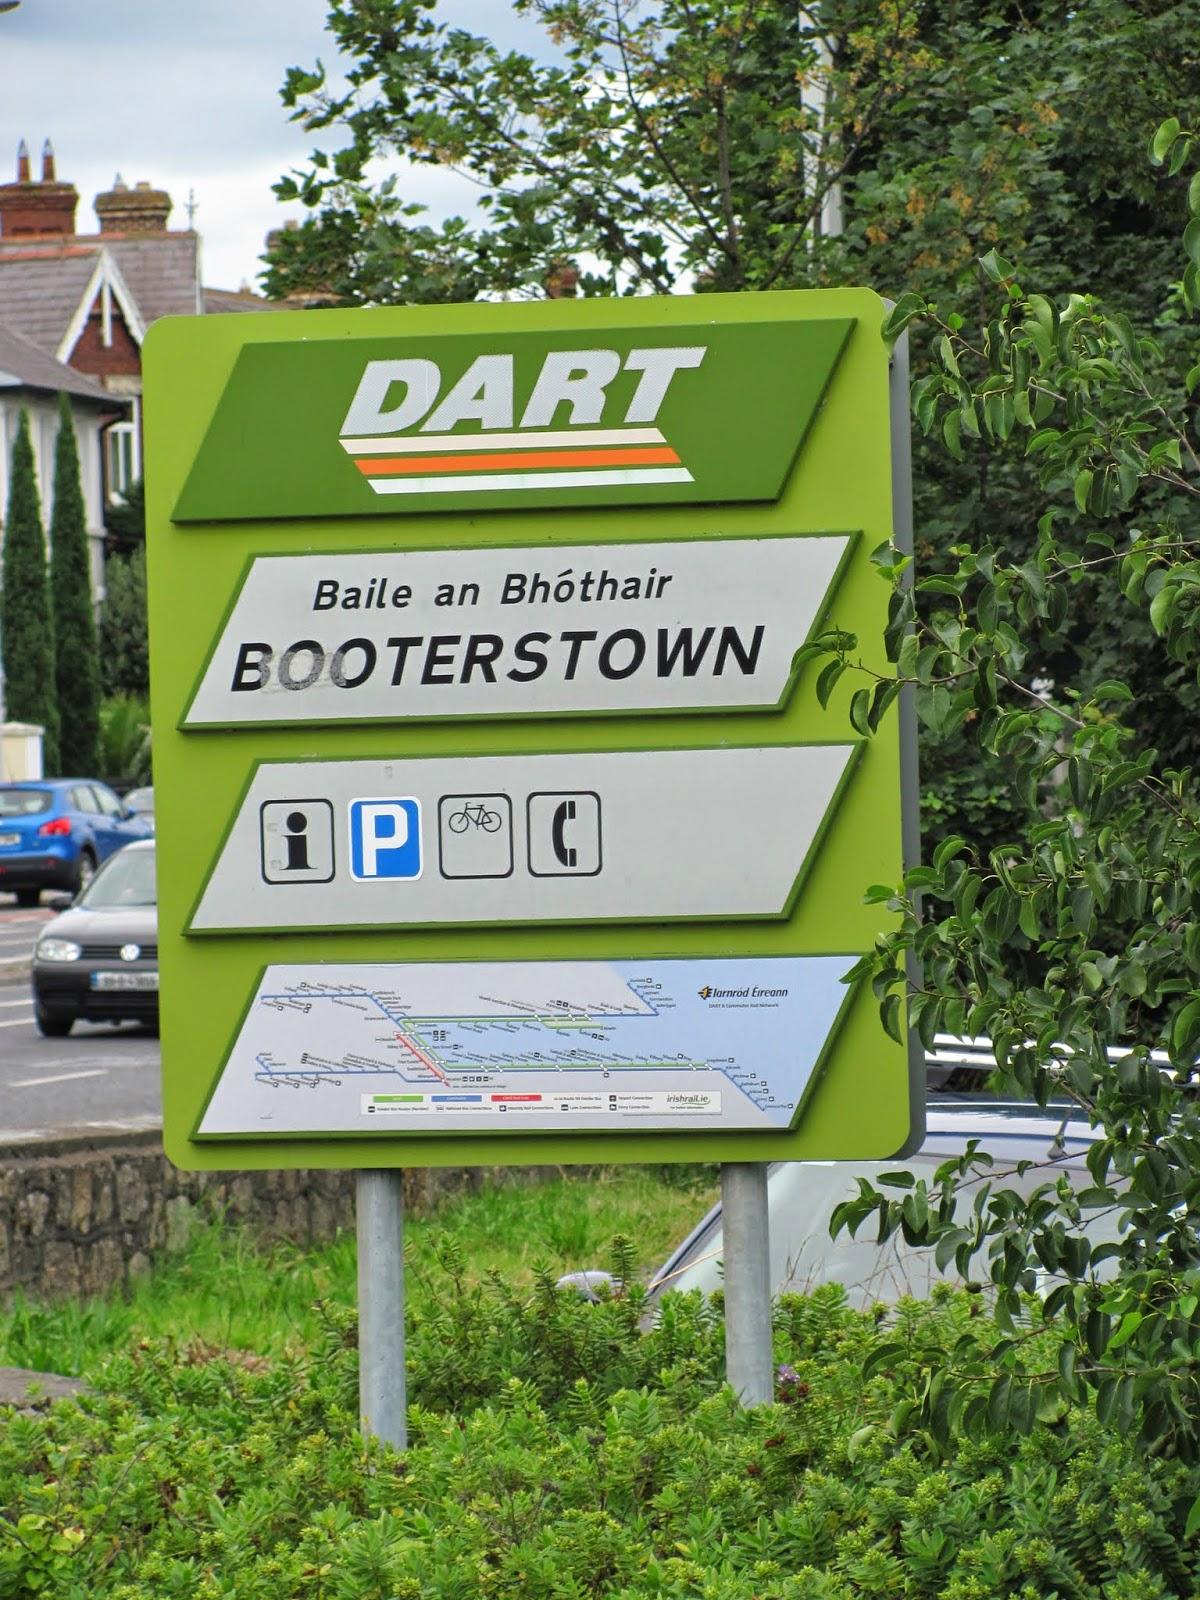 Booterstown Train Station Dublin, Ireland